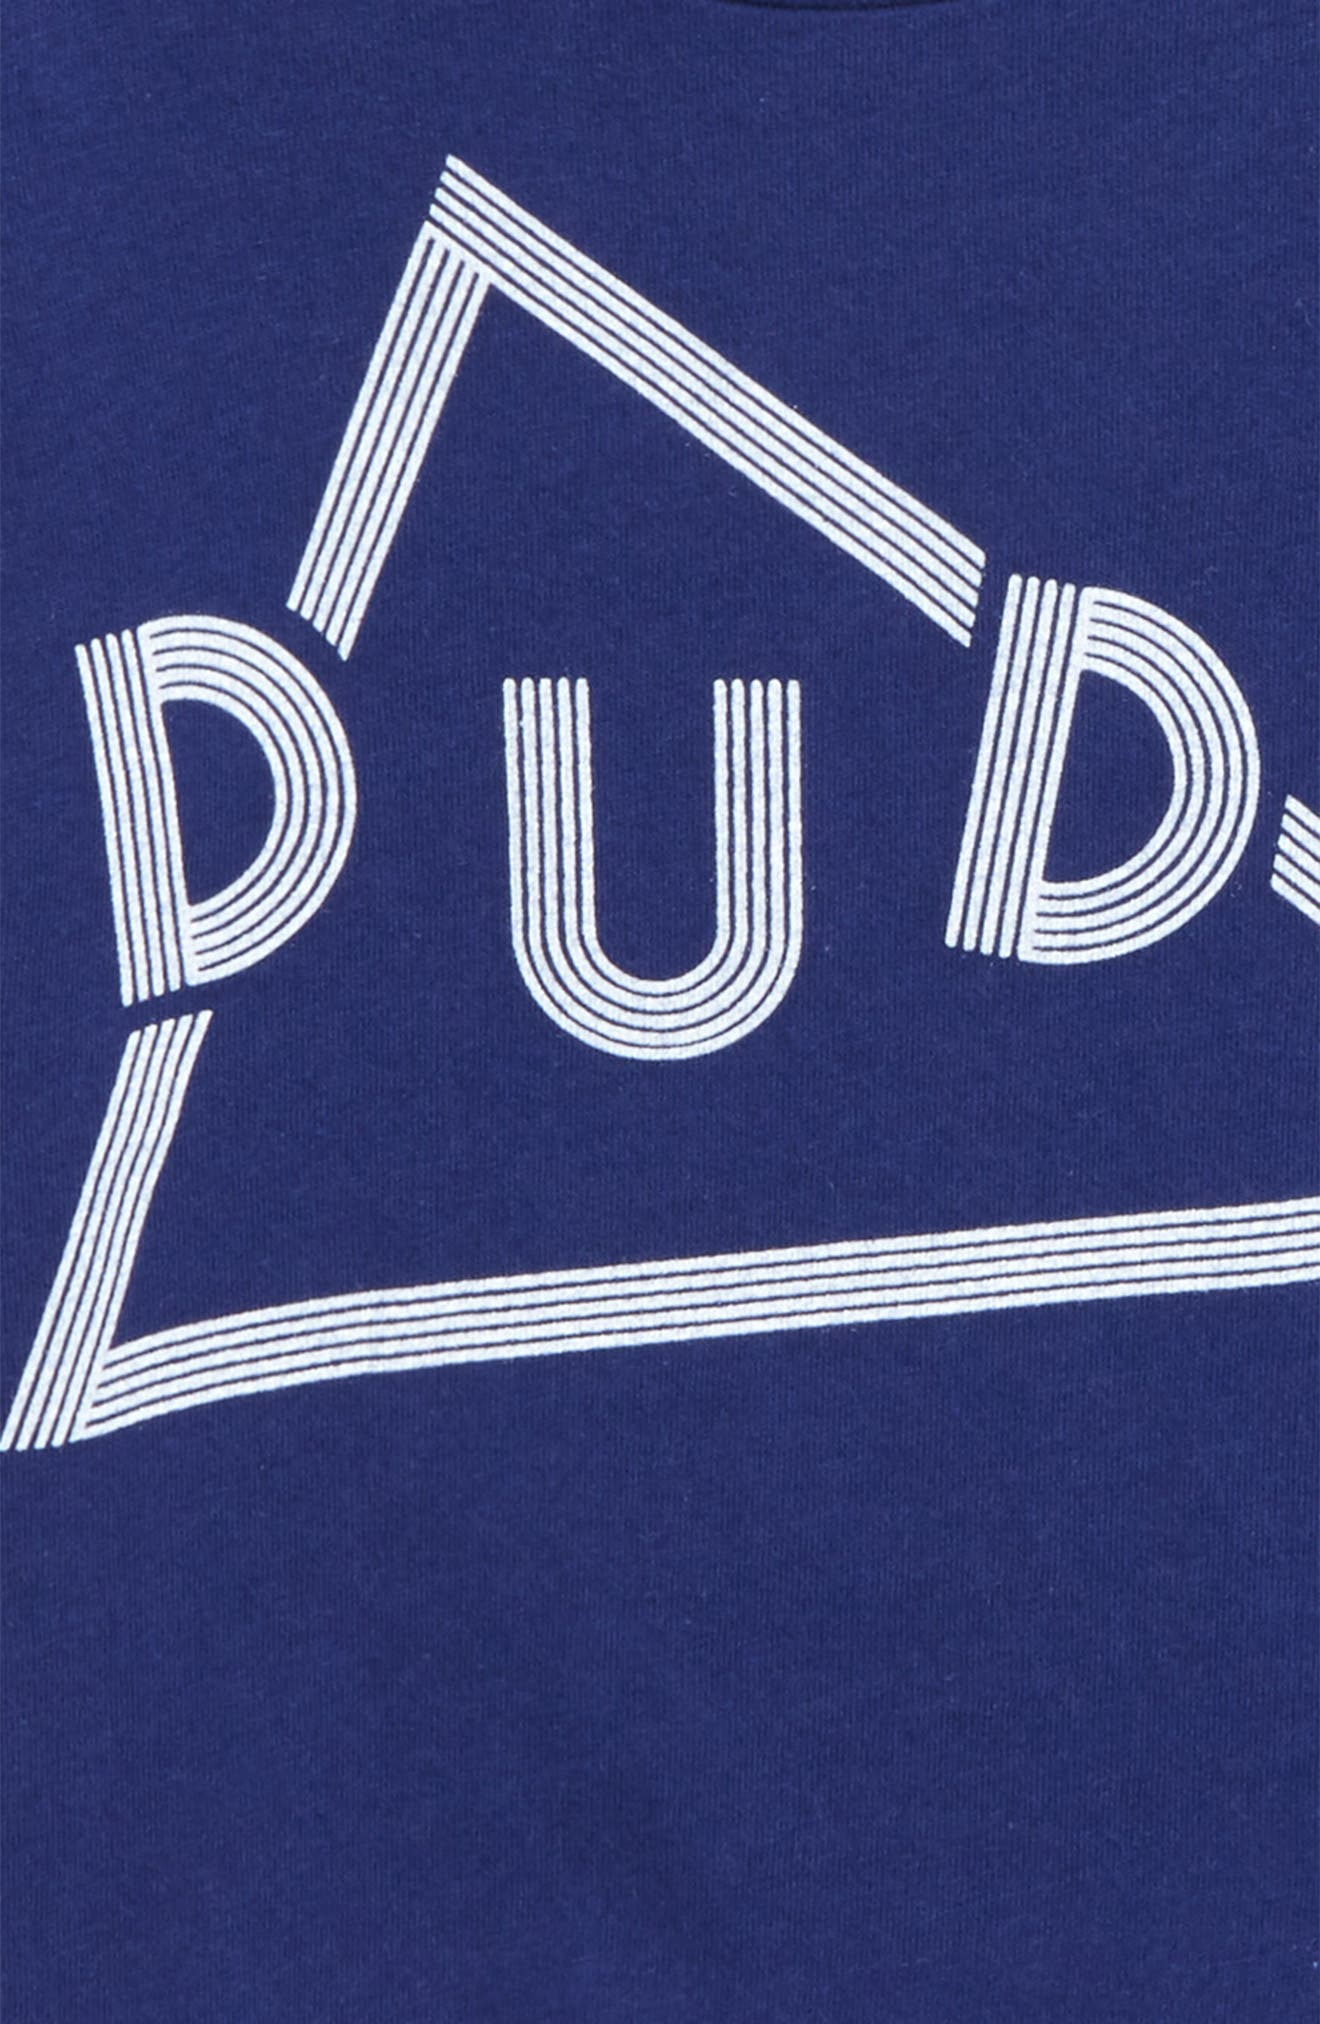 Dude Graphic T-Shirt,                             Alternate thumbnail 2, color,                             410